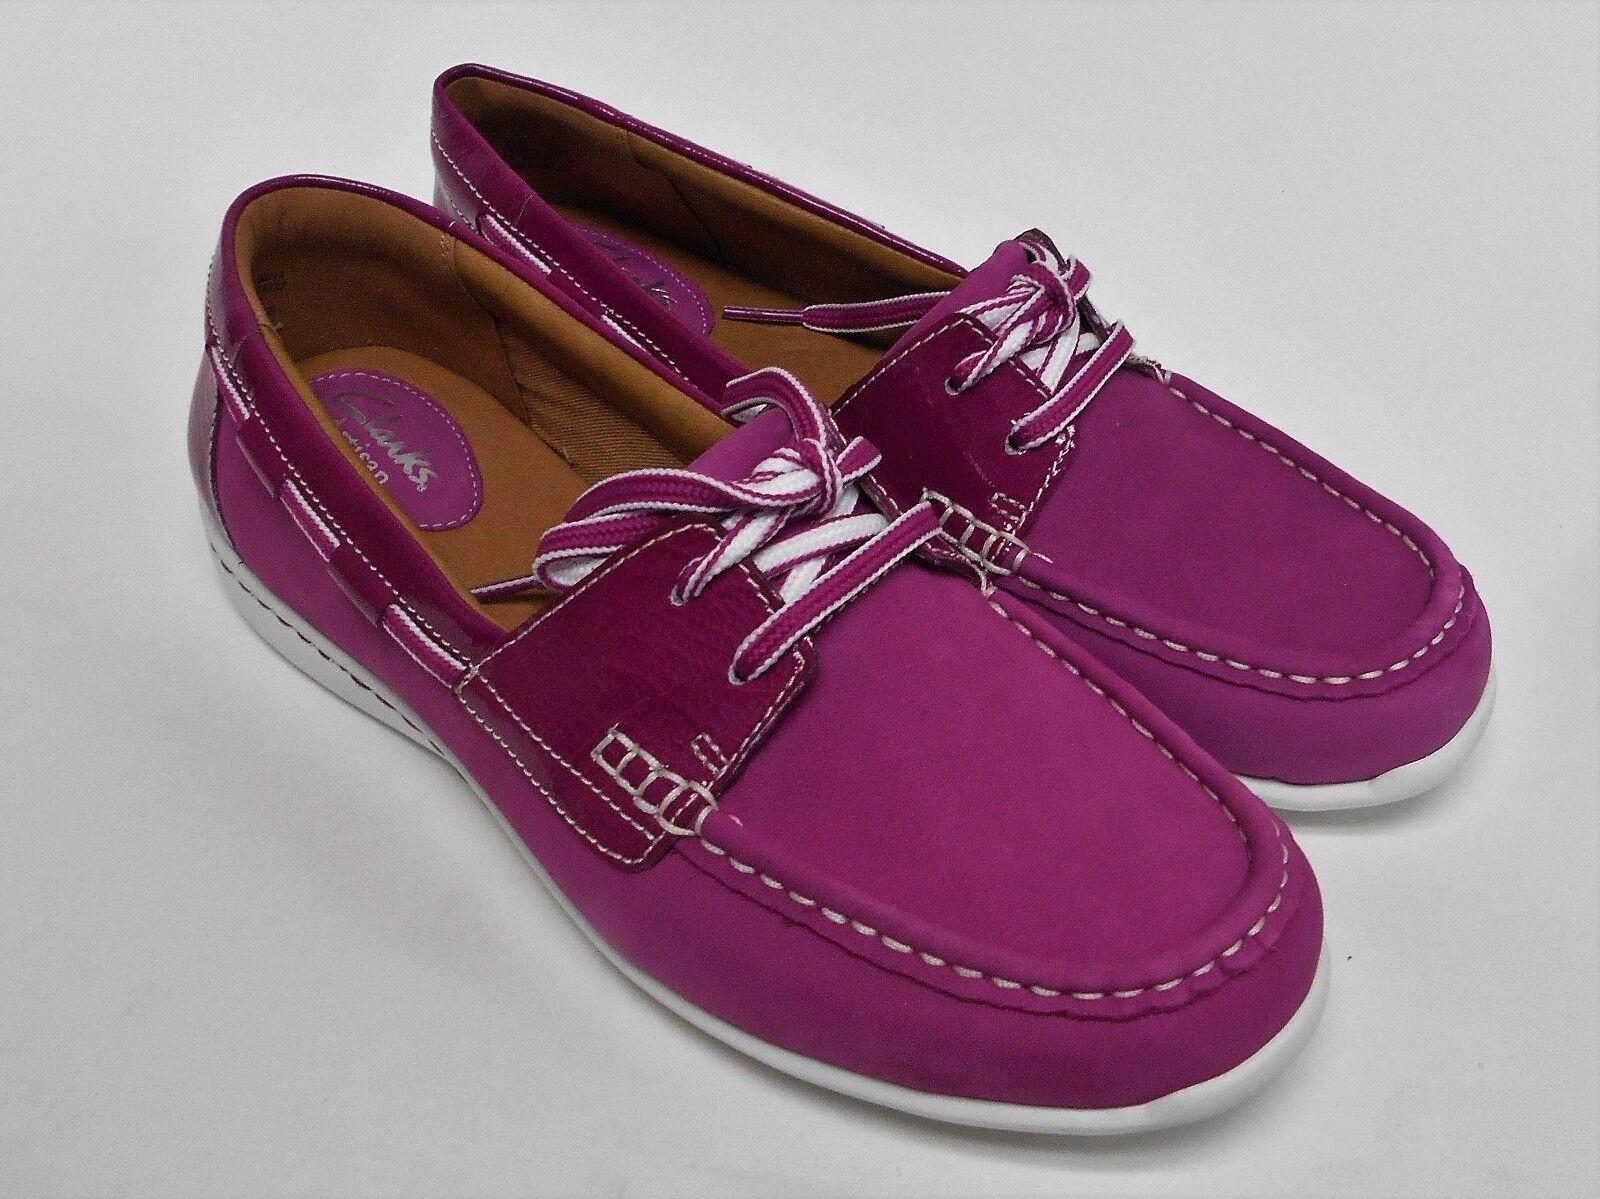 D010 New Women's Clarks Cliffrose Sail Fuchsia Lace Up Boat Shoes 10 M